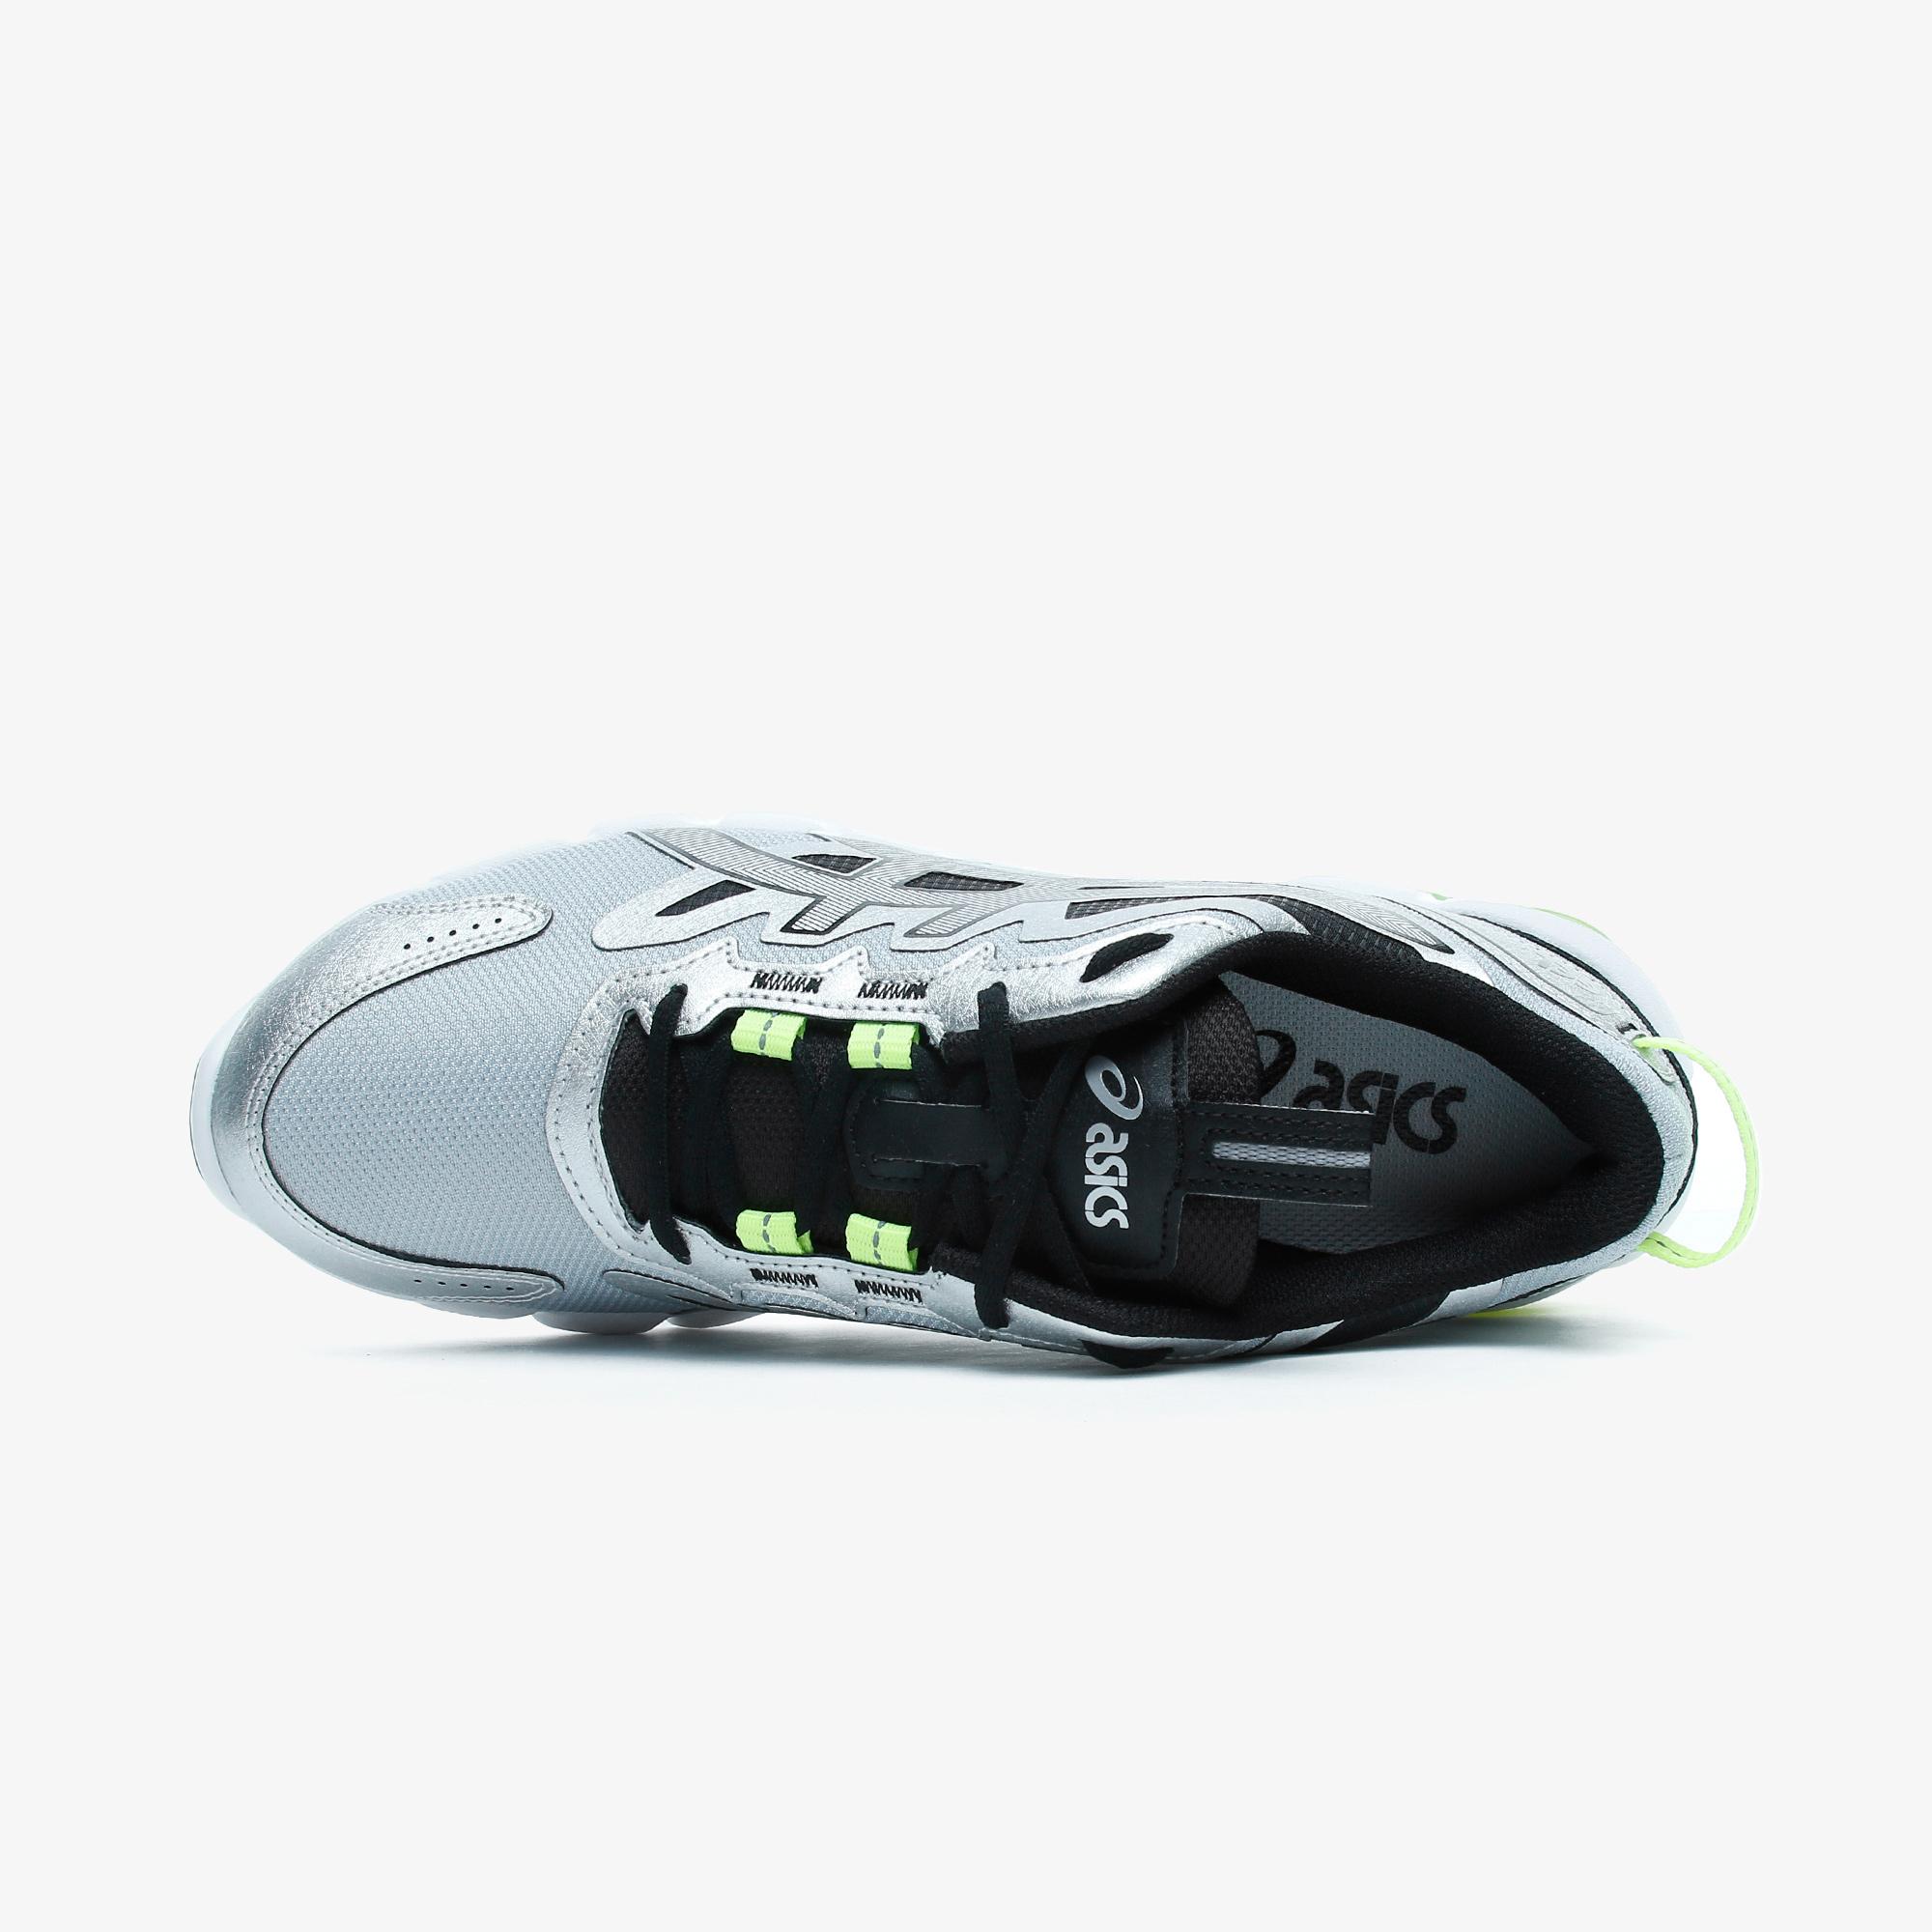 Asics Gel-Quantum 90 Erkek Siyah Spor Ayakkabı